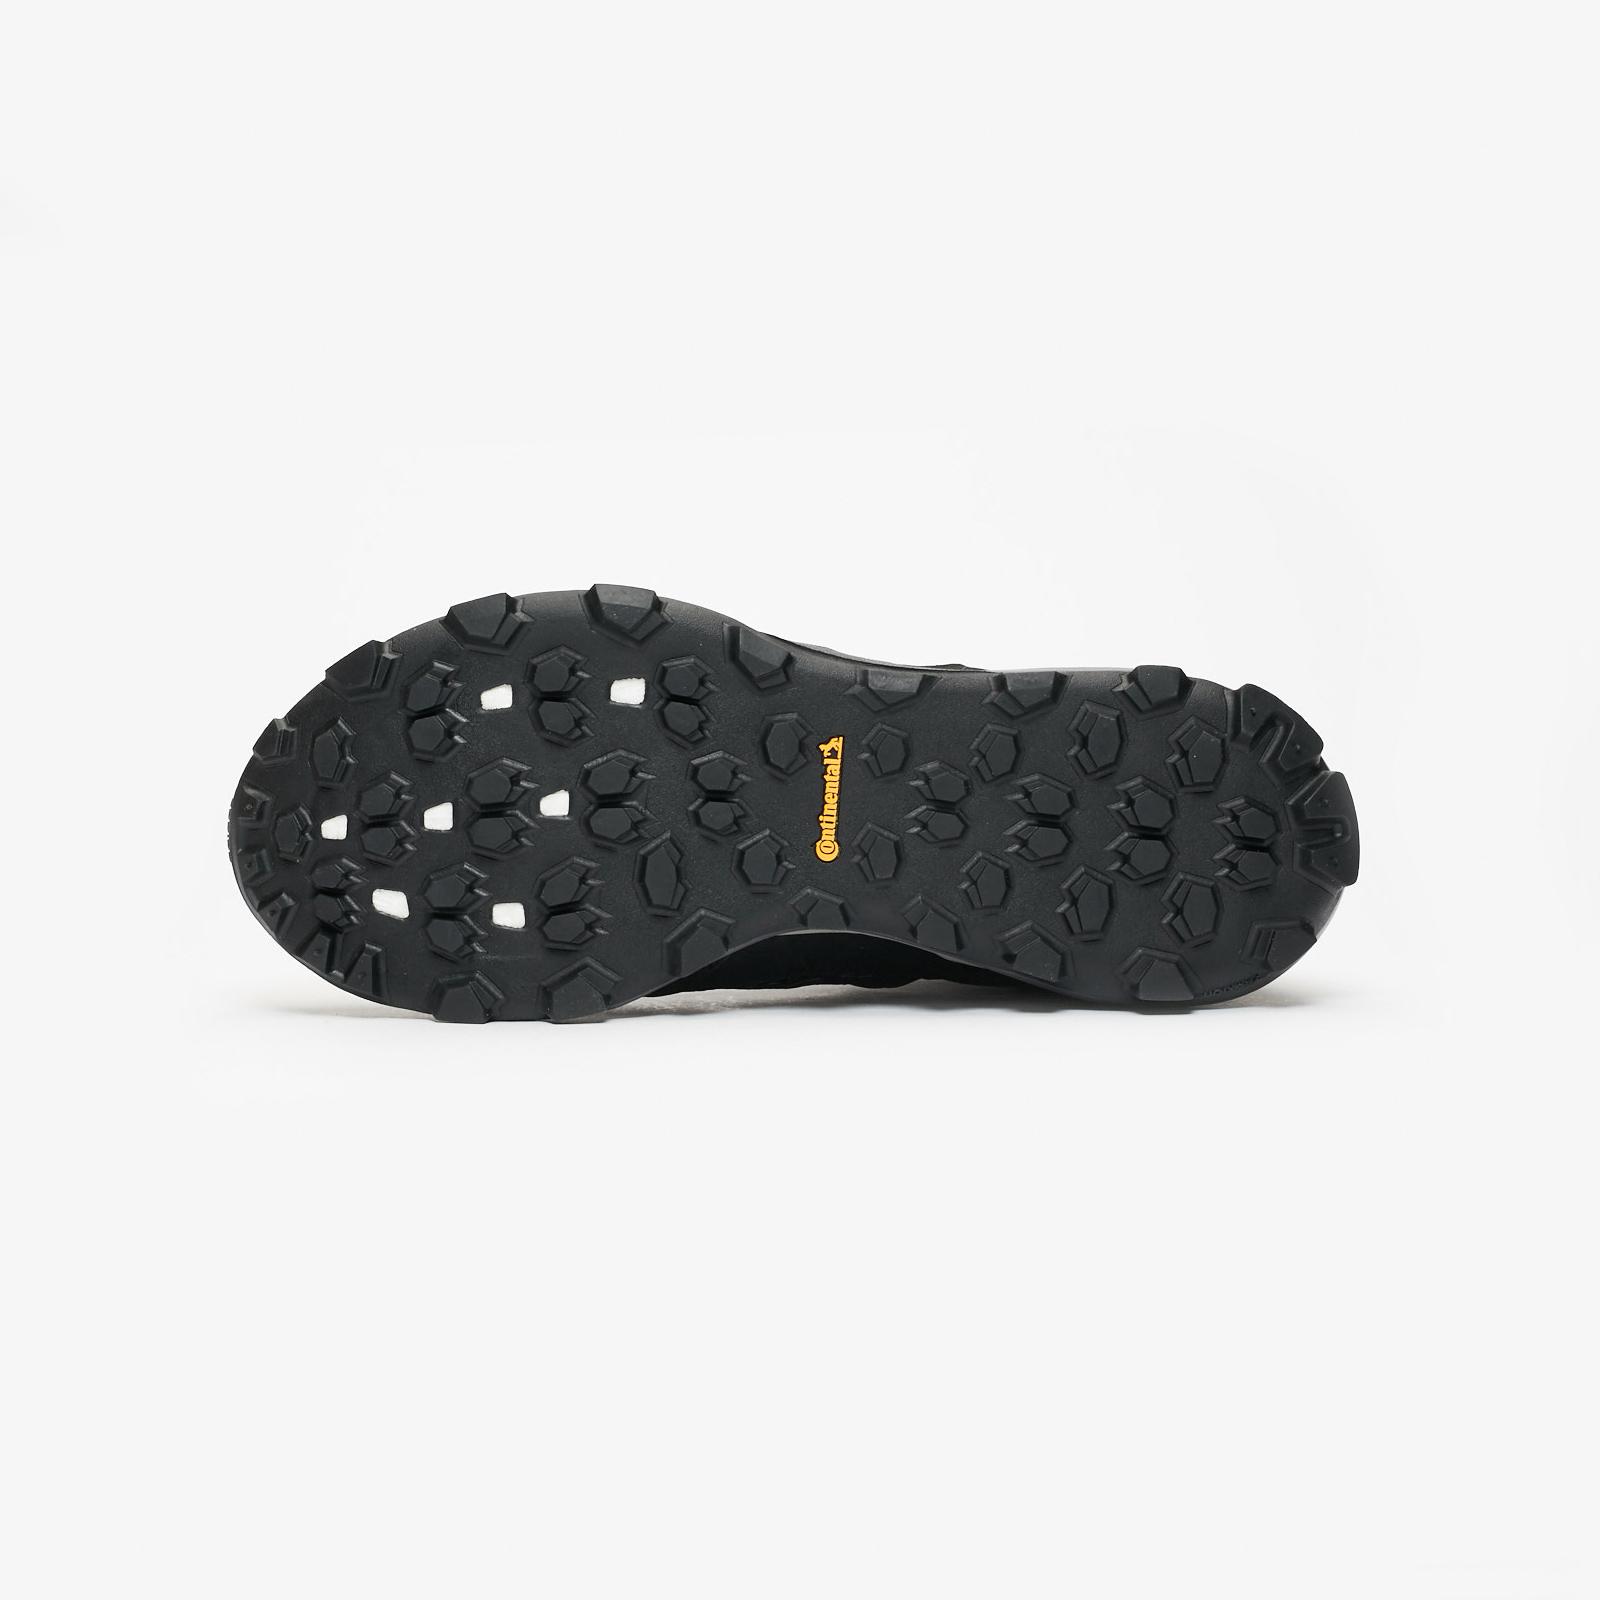 Atlas toda la vida Miseria  adidas Adizero XT Boost x UNDFTD - Cg7169 - Sneakersnstuff   sneakers &  streetwear online since 1999